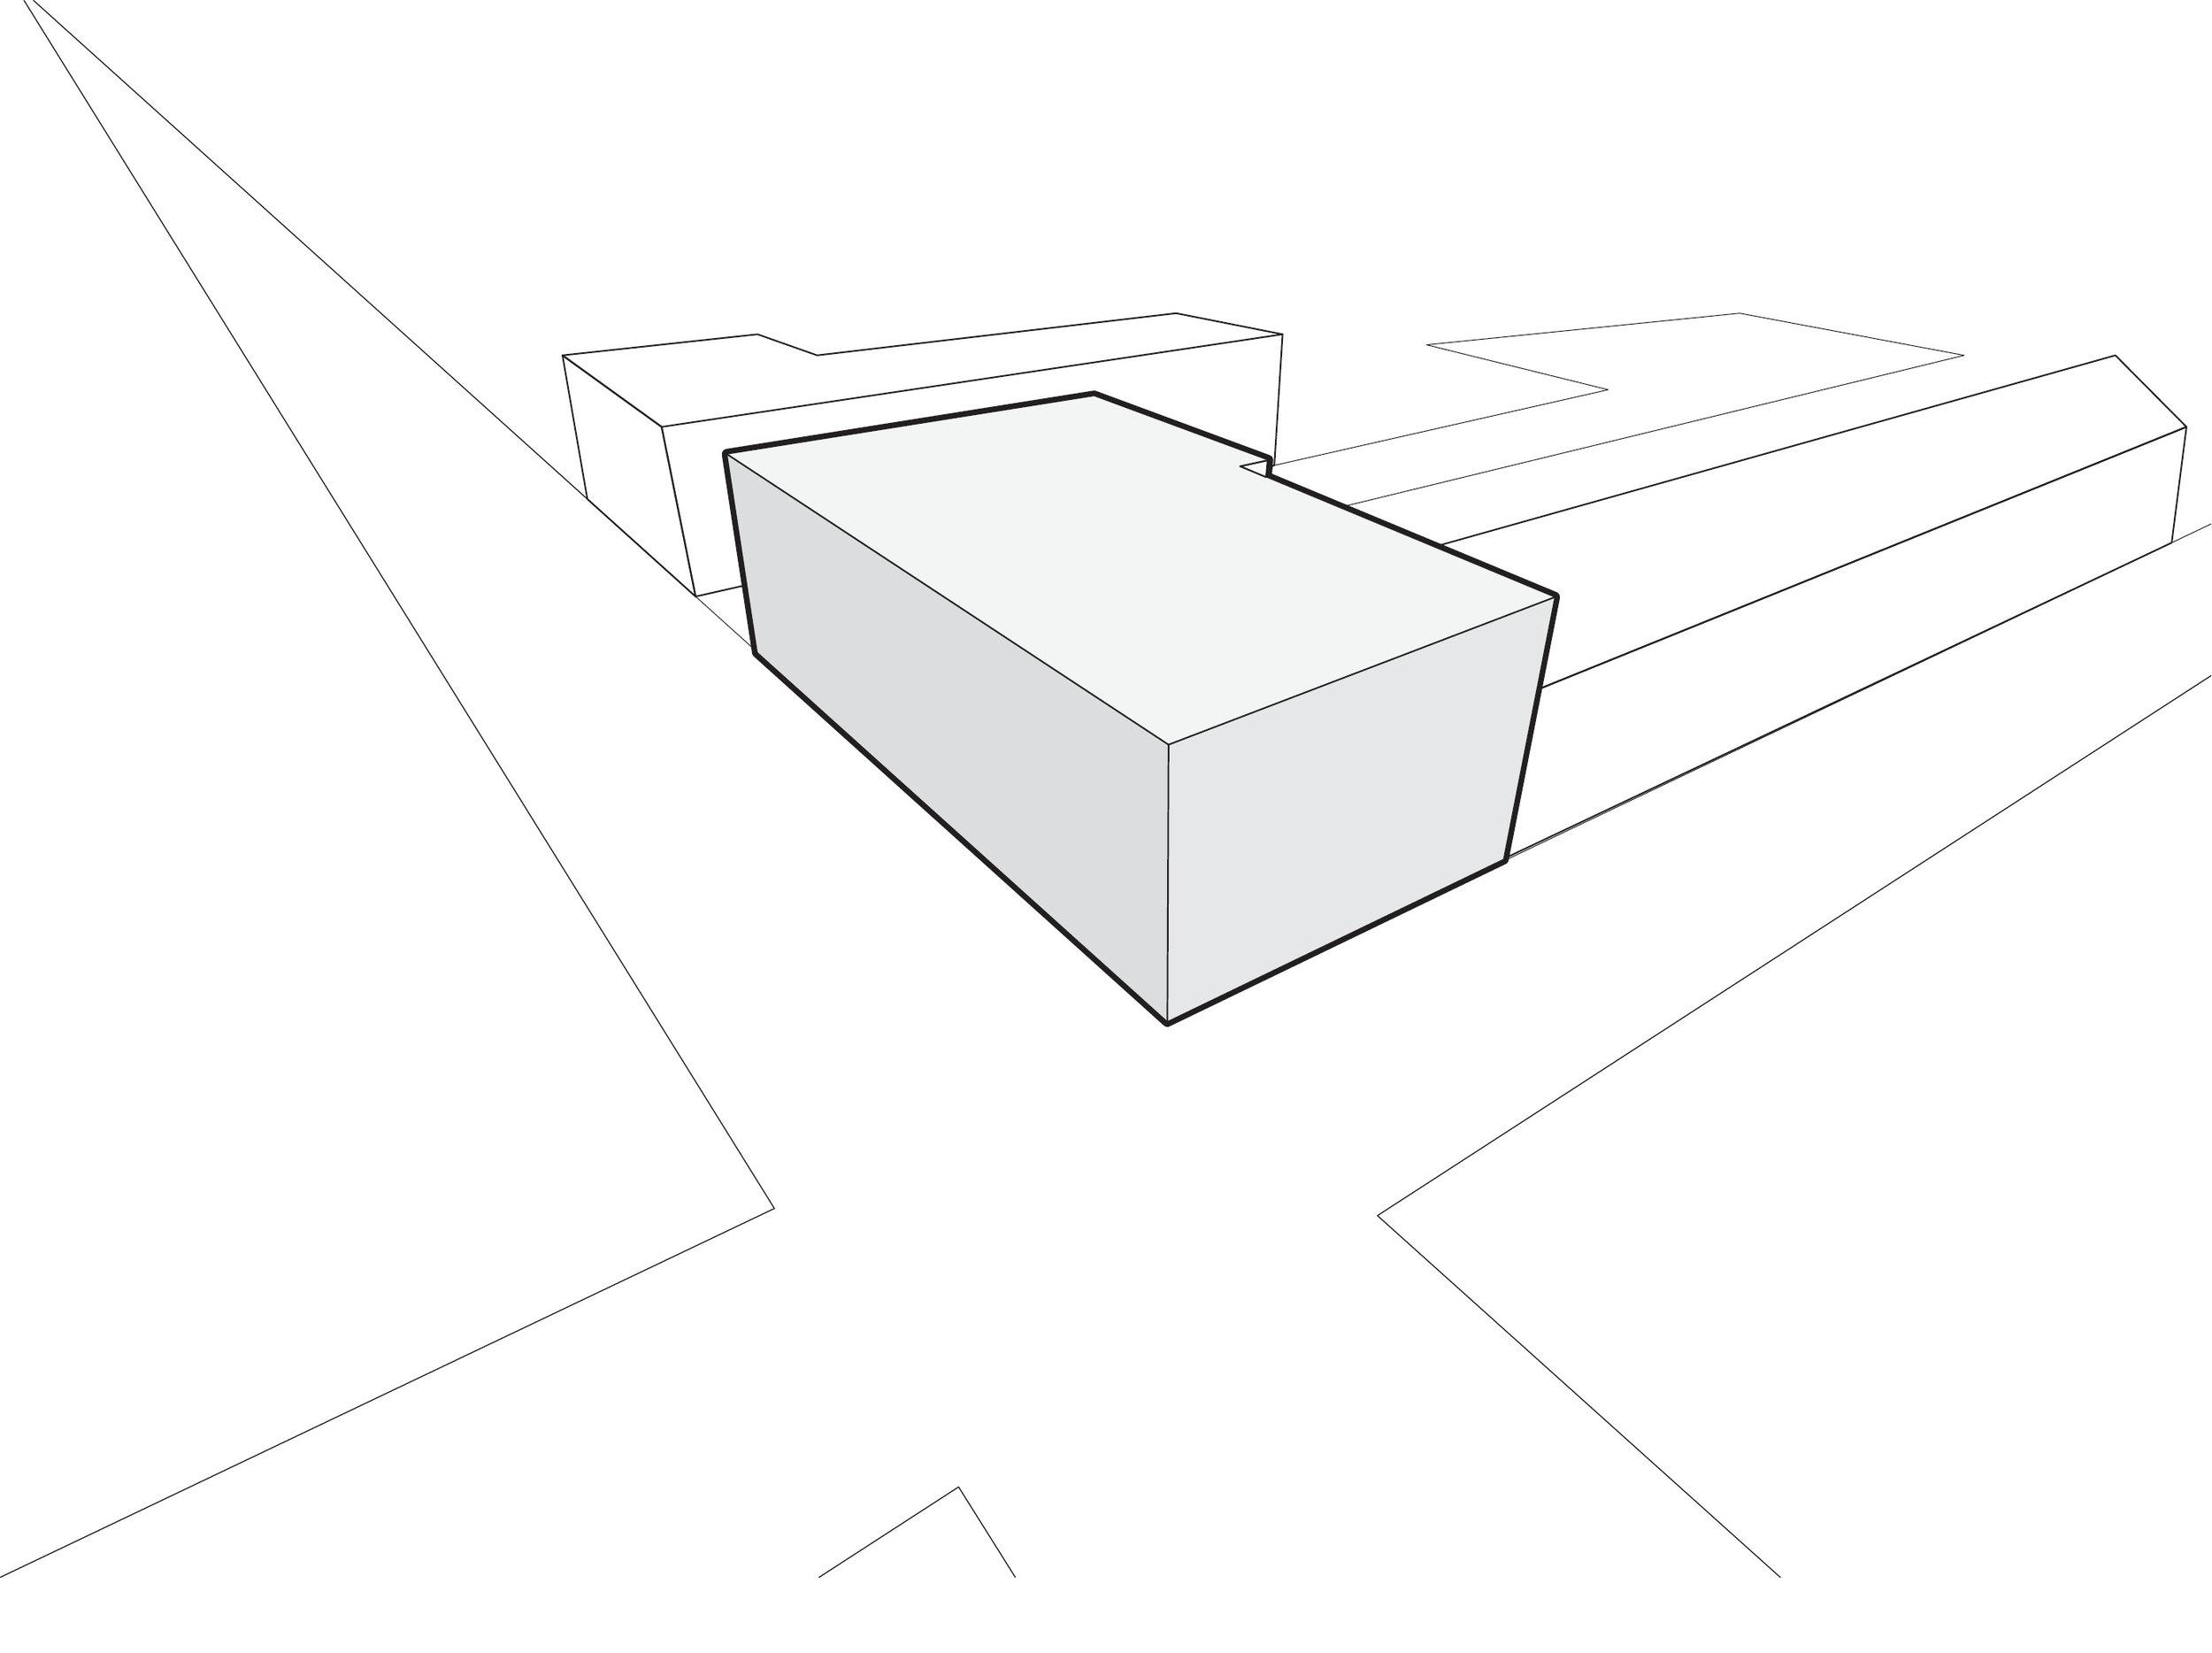 Personal-Architecture-nijmegen-appartementencomplex-2.jpg